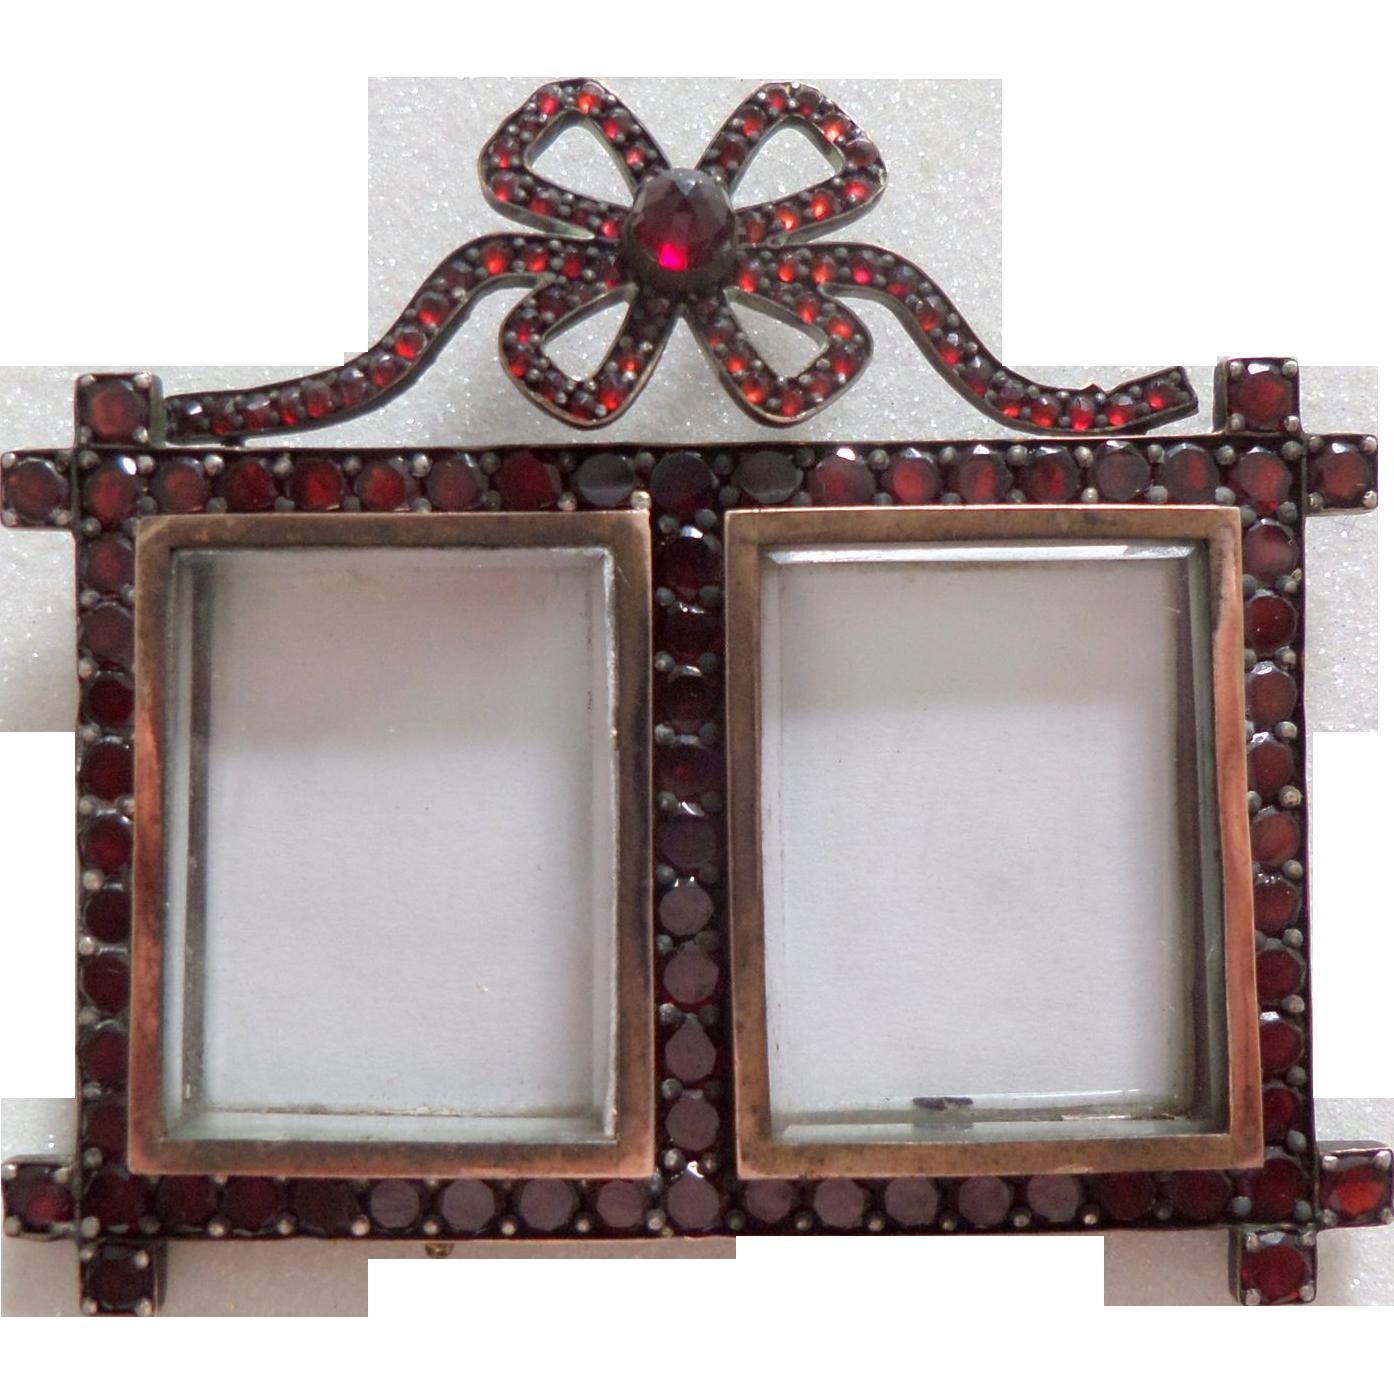 miniature garnet double photo frame c1880 - Double Photo Frame